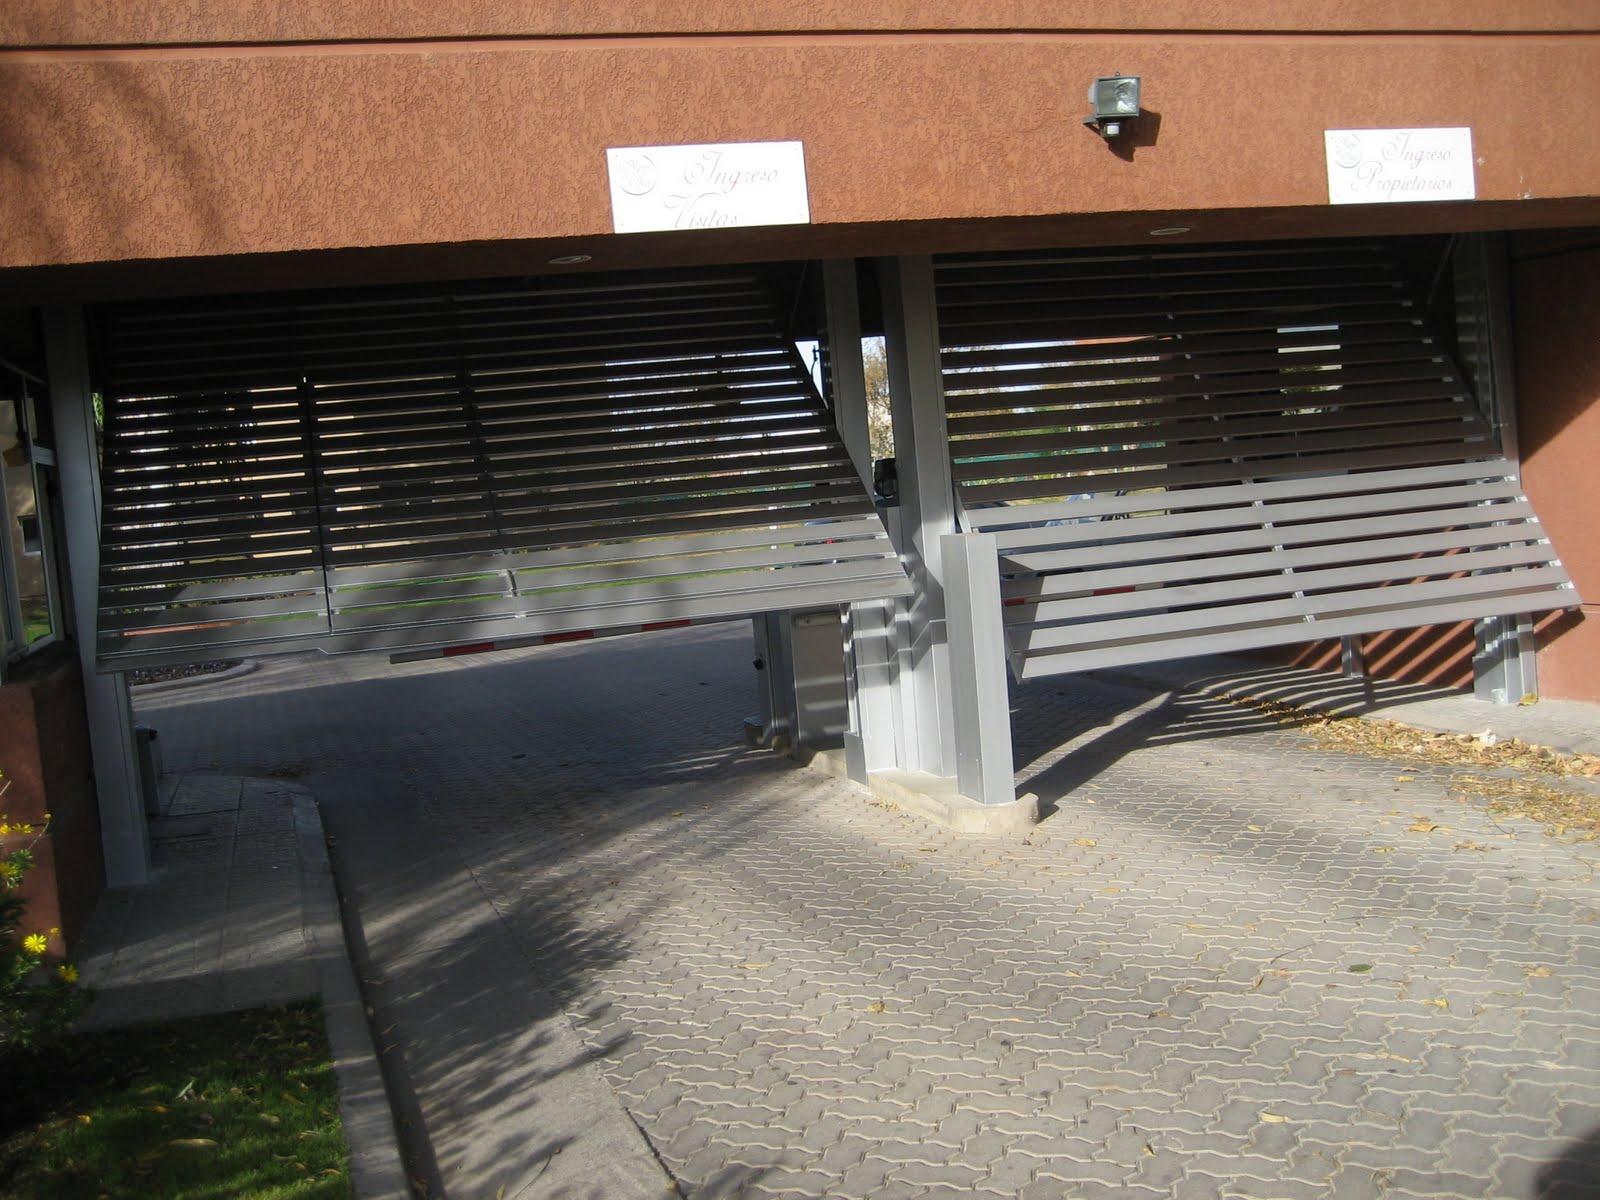 Megaport srl portones autom ticos seguros y confiables for Garajes modelos